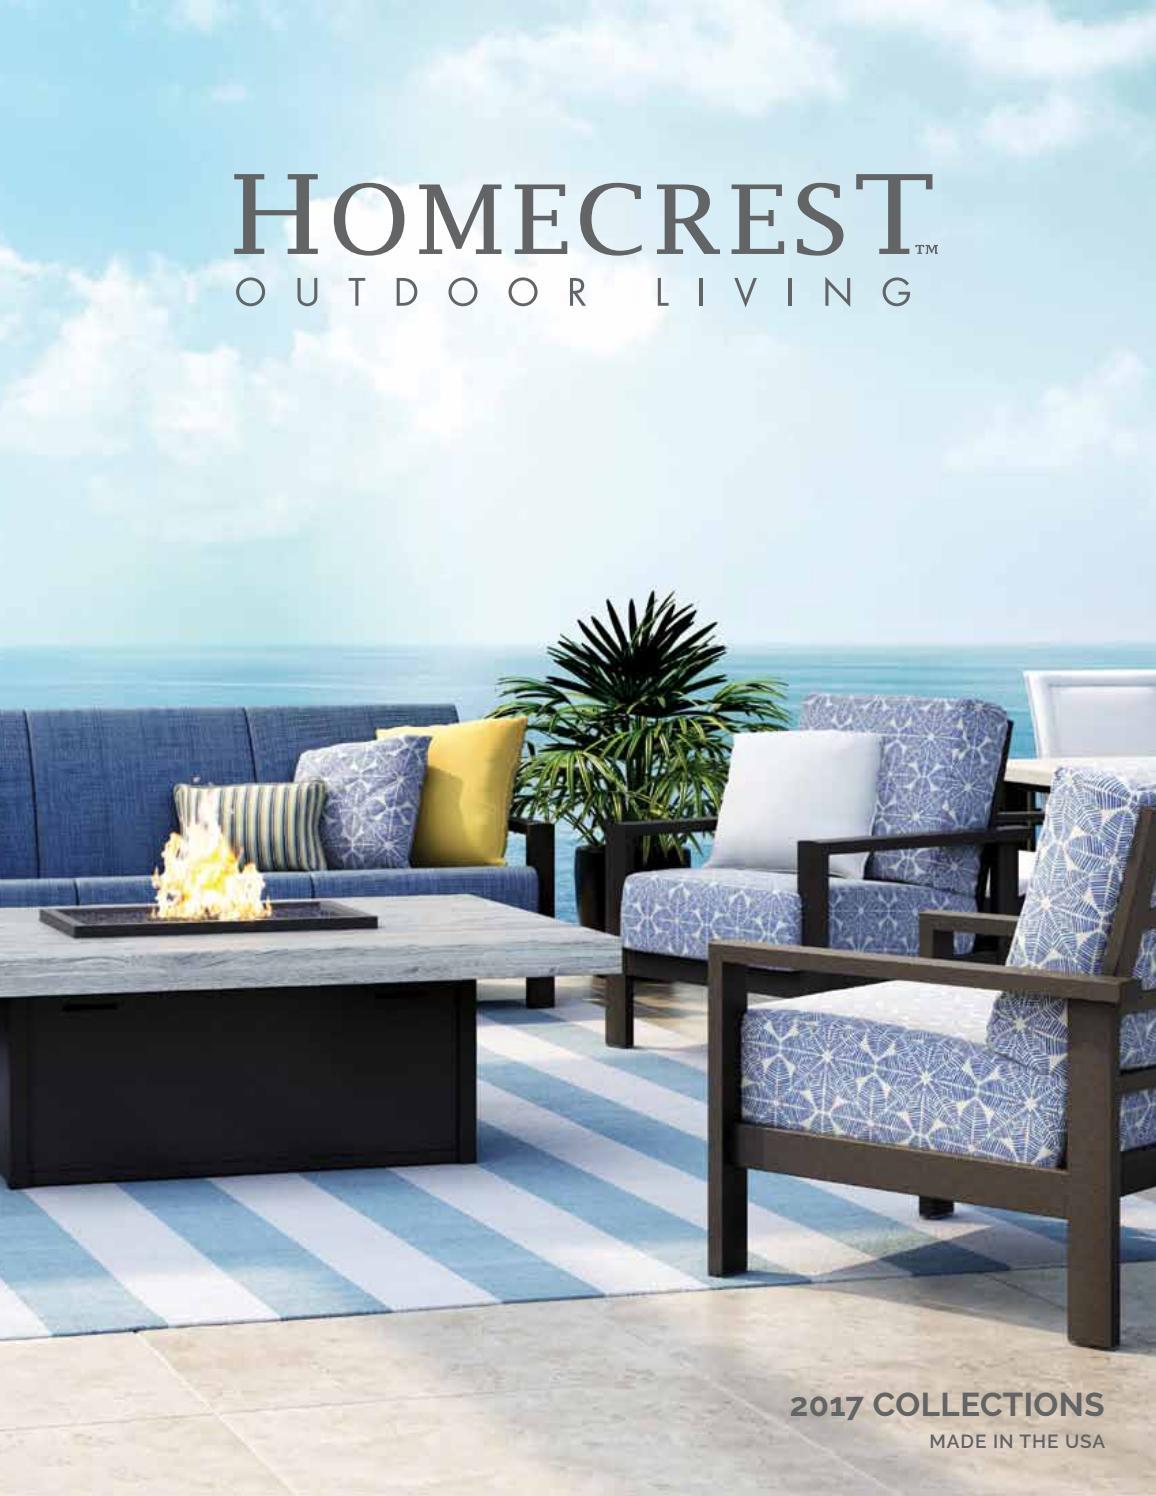 2017 Homecrest Dealer Catalog By Homecrest Outdoor Living   Issuu